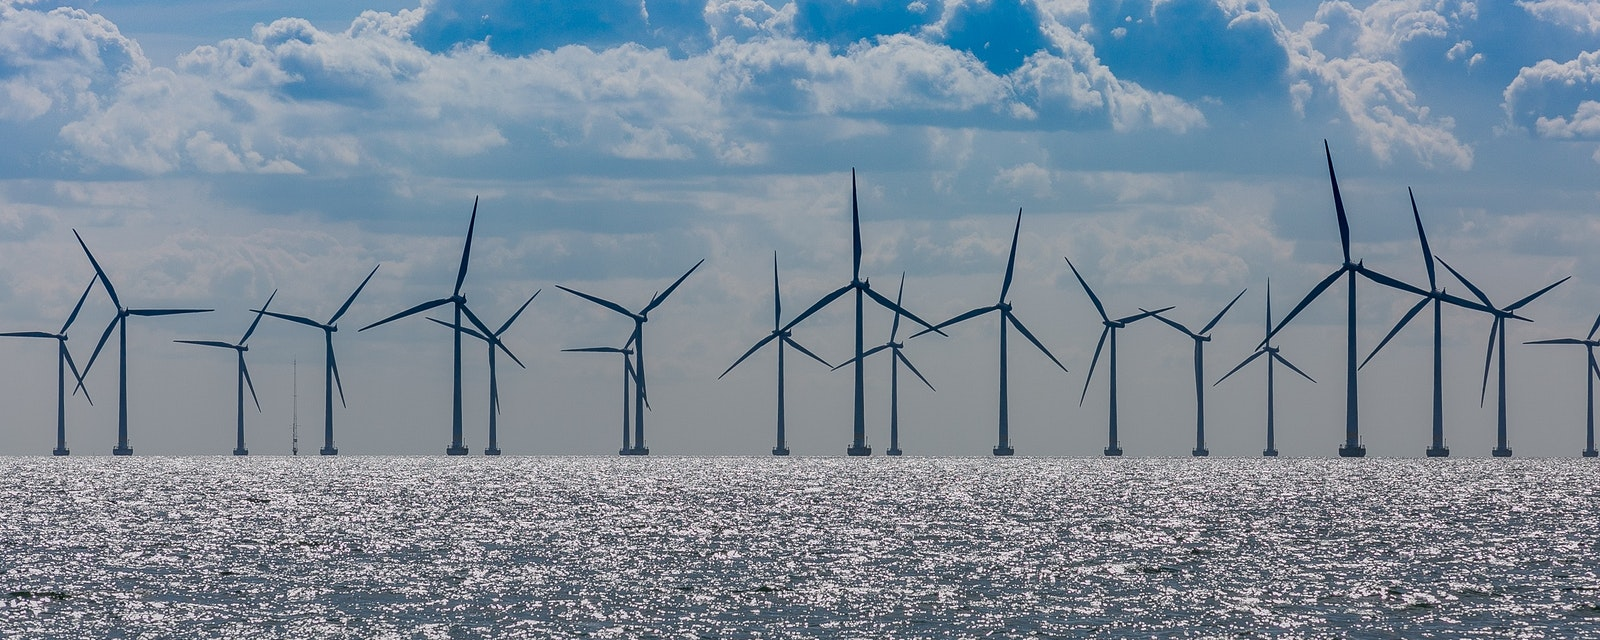 Windmills,In,The,Sea.,Wind,Power.,Green,Energy